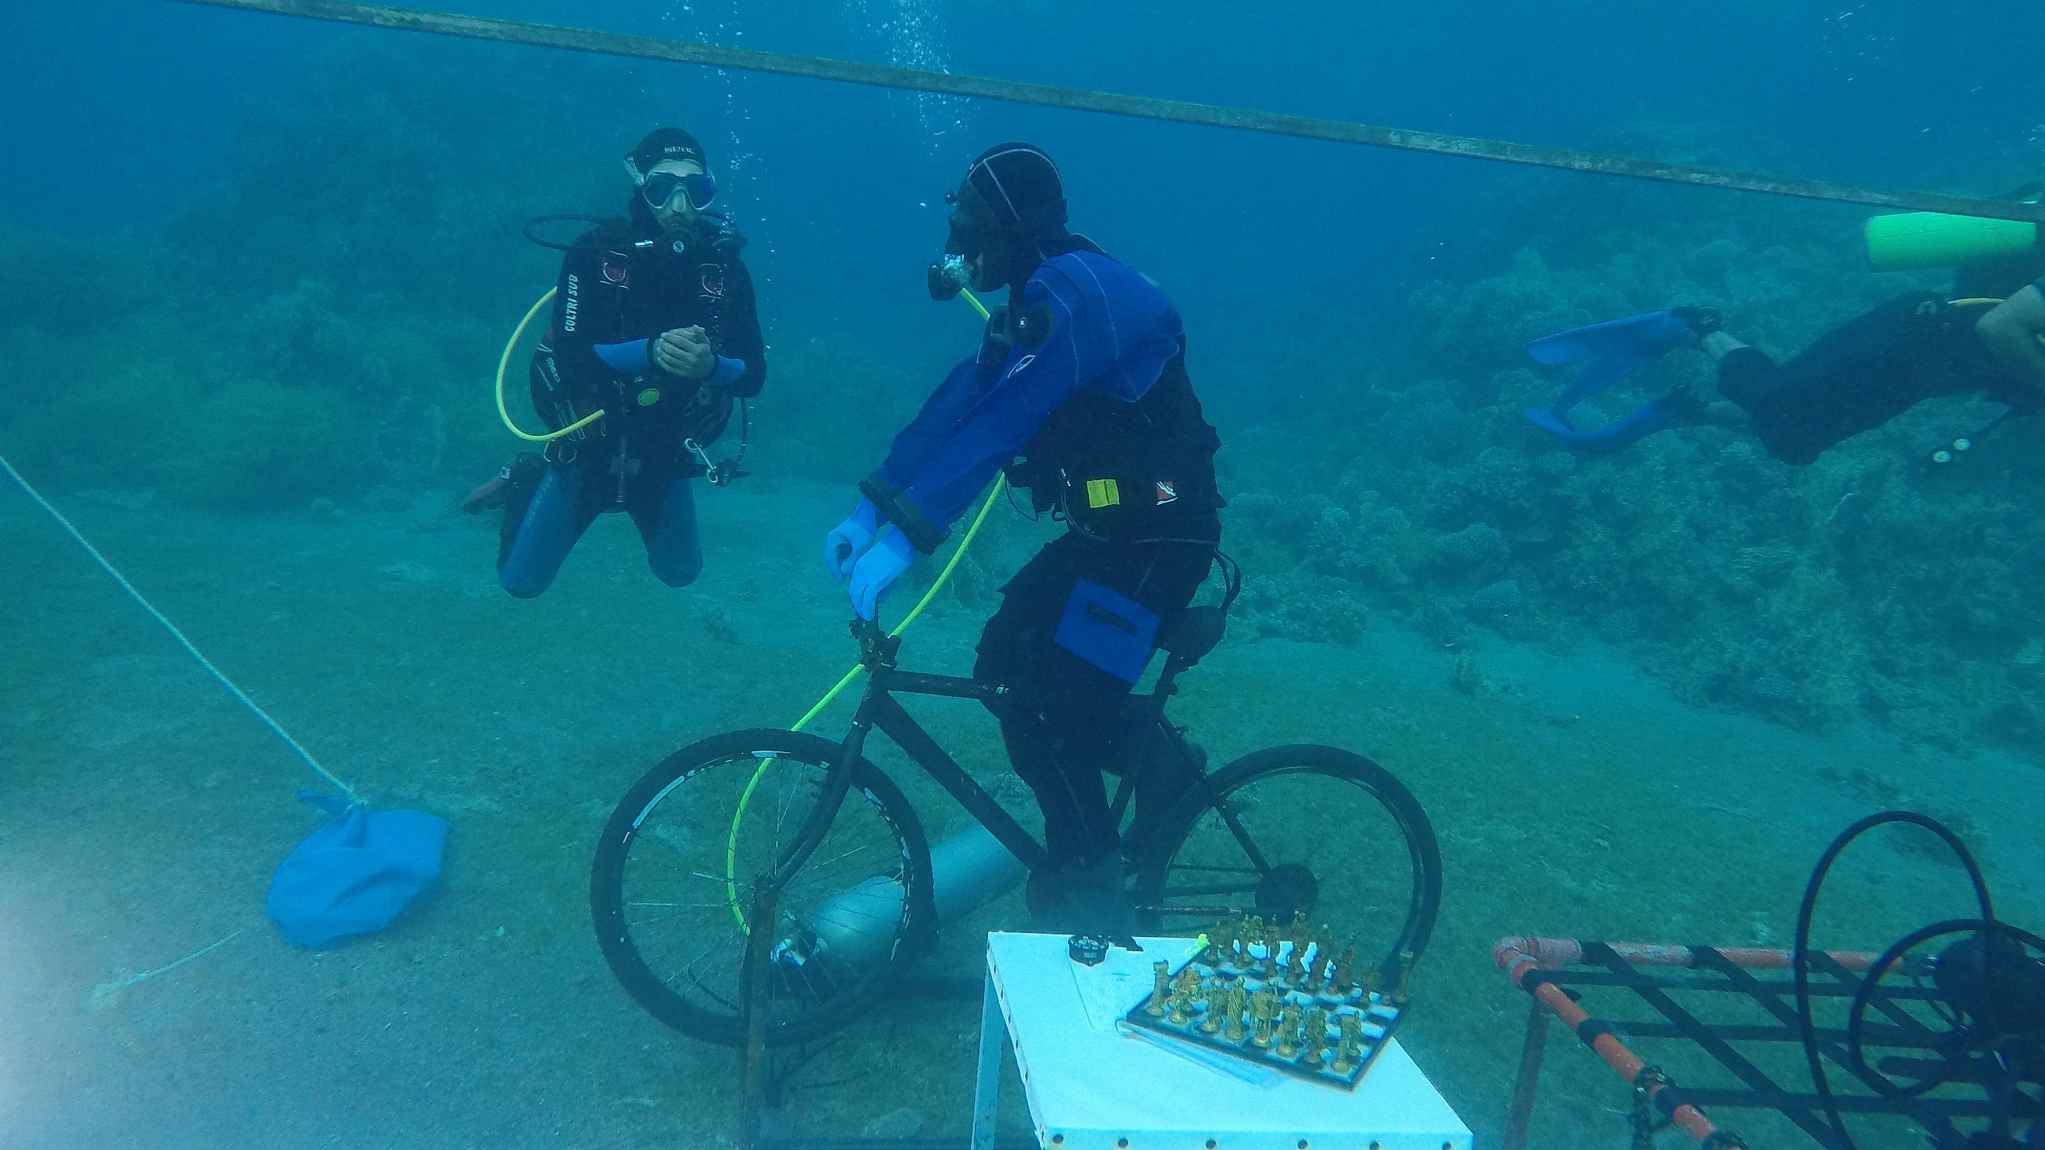 Man spends 48 hours living underwater